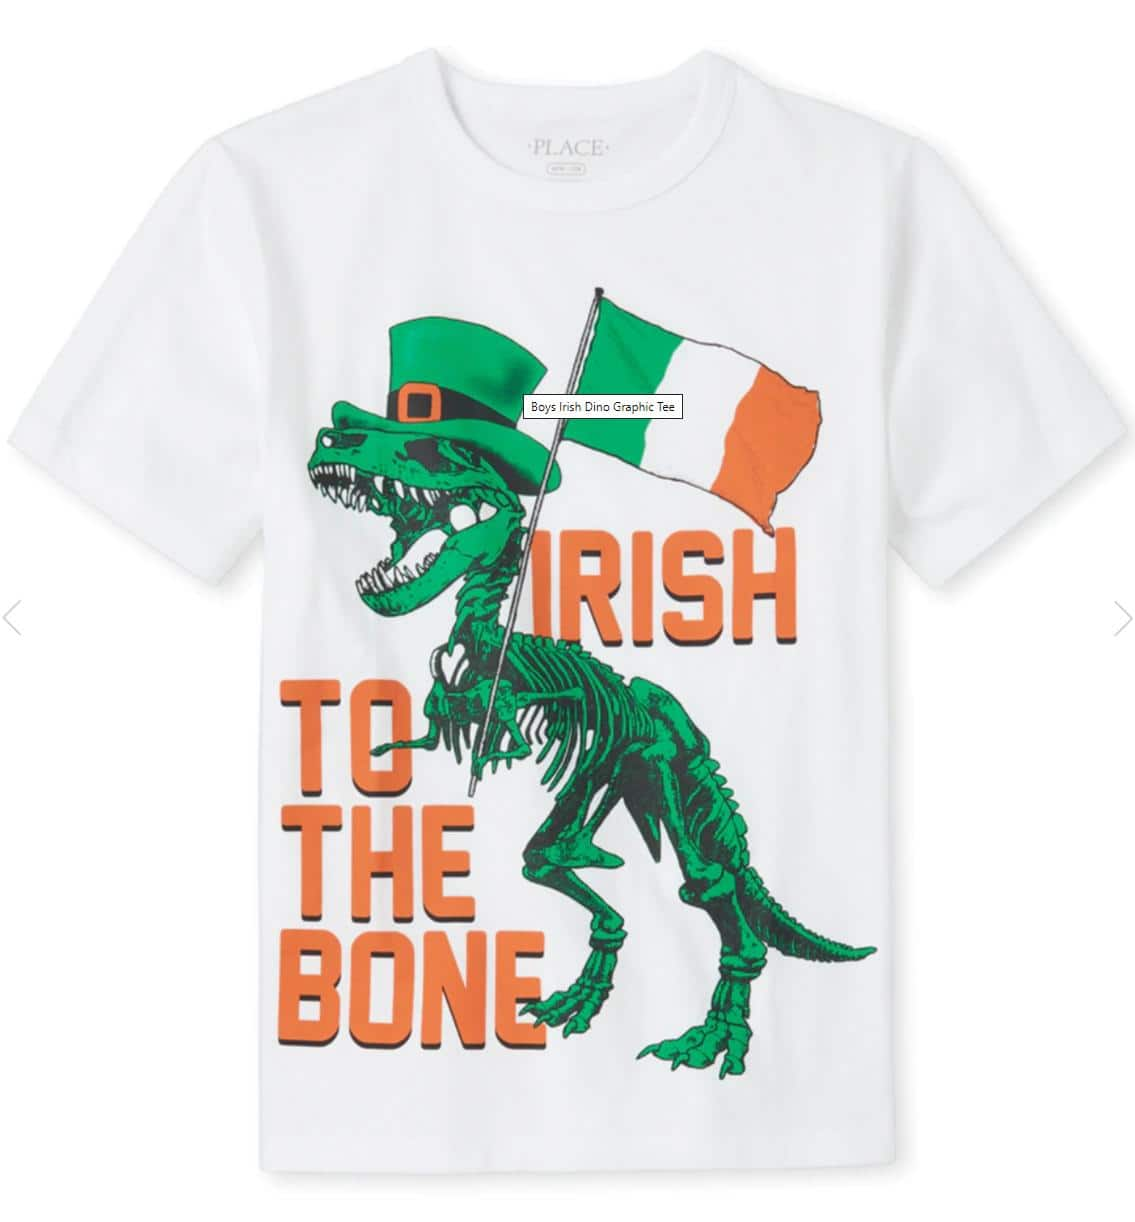 Big Boys' Irish Dino Graphic Tee (Sizes 5-16)